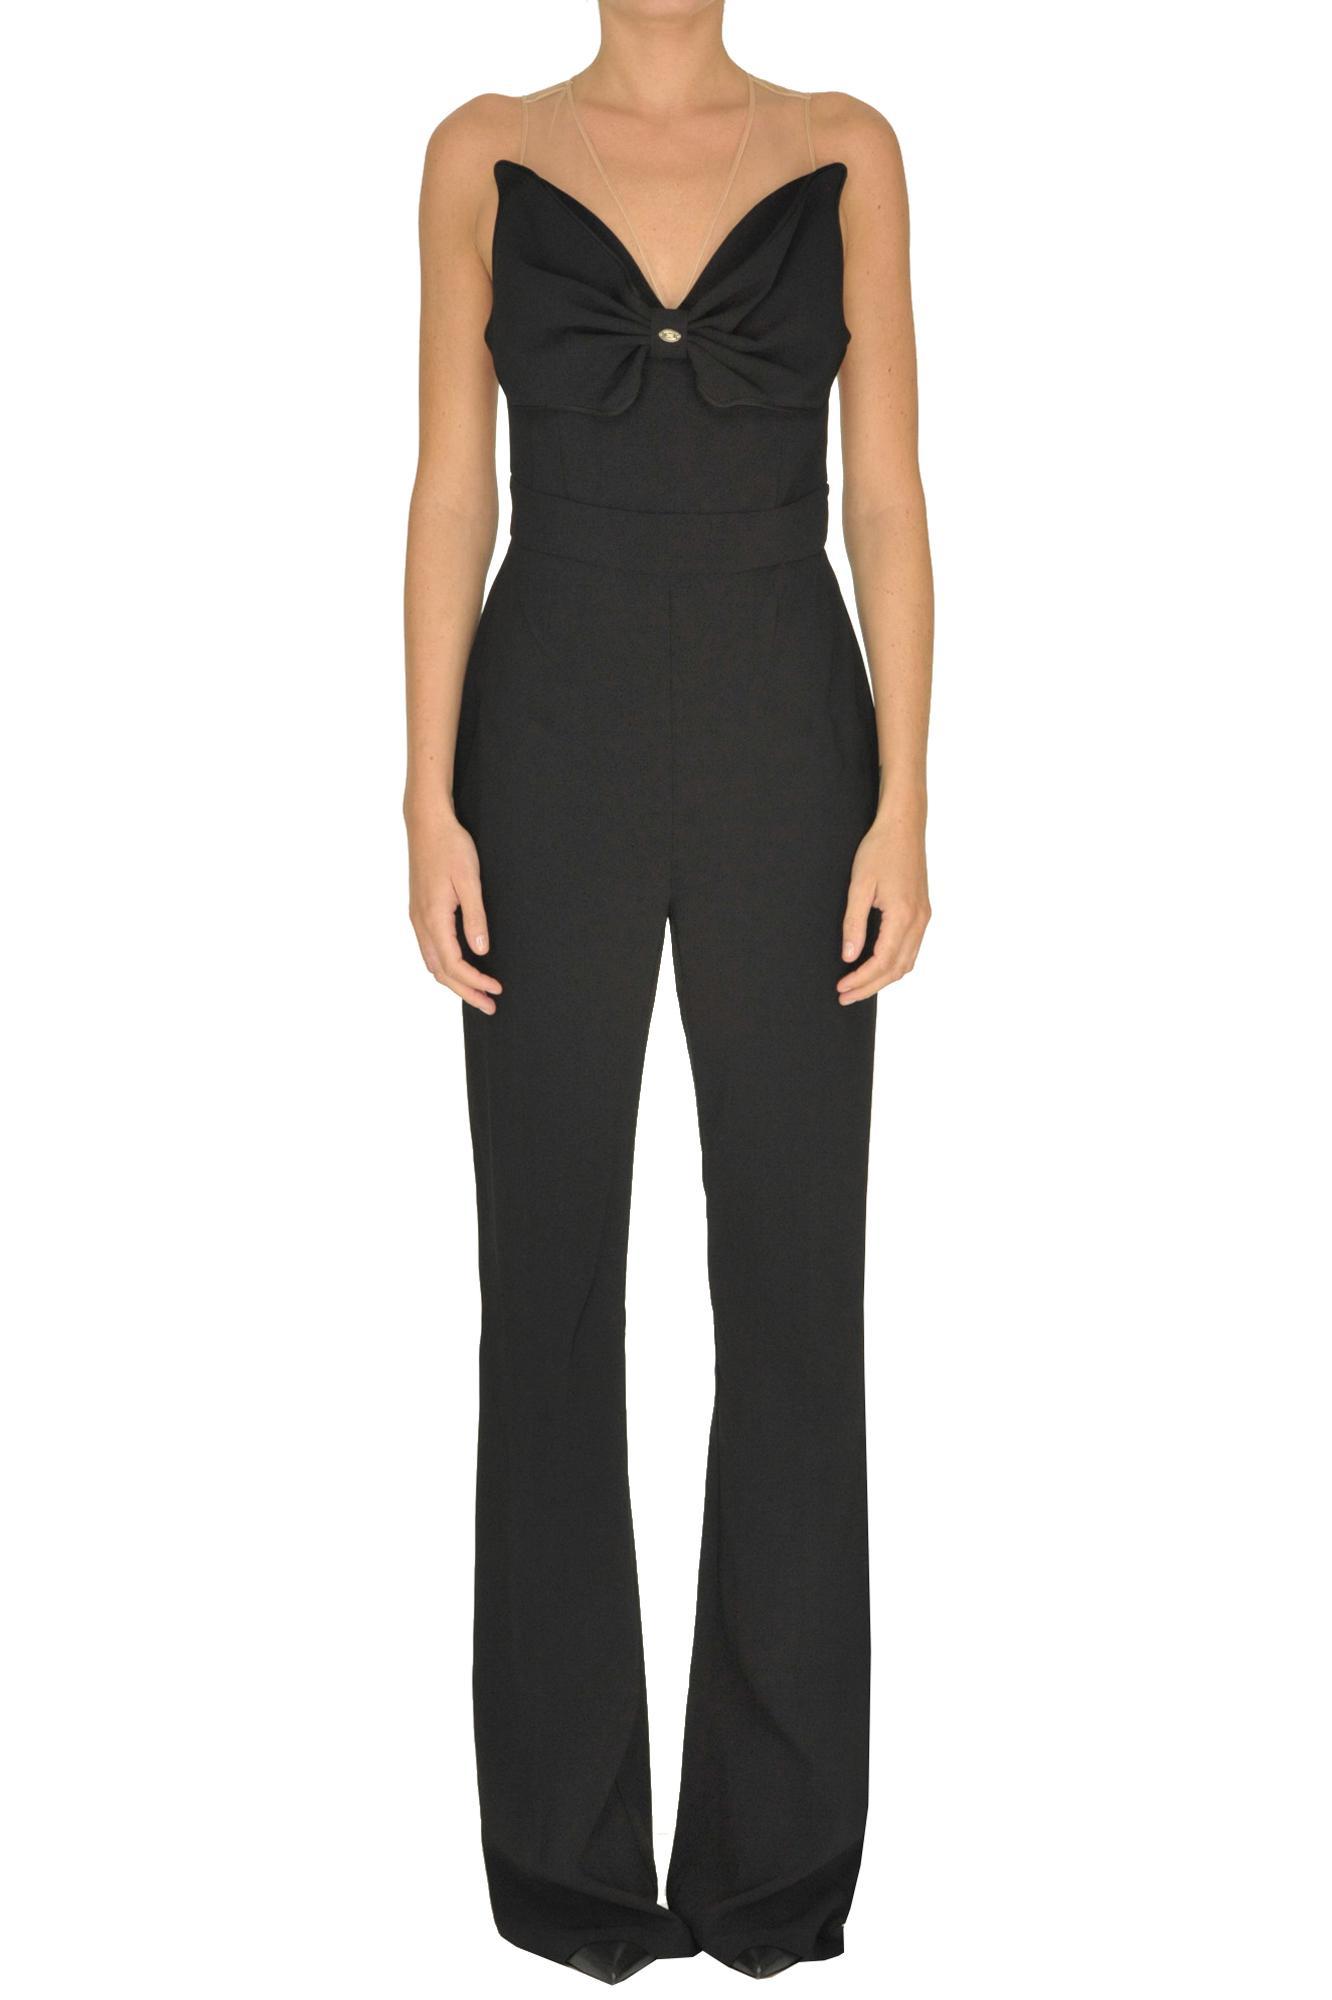 3b45833e7c16 Lyst - Elisabetta Franchi Maxi Bow Jumpsuit in Black